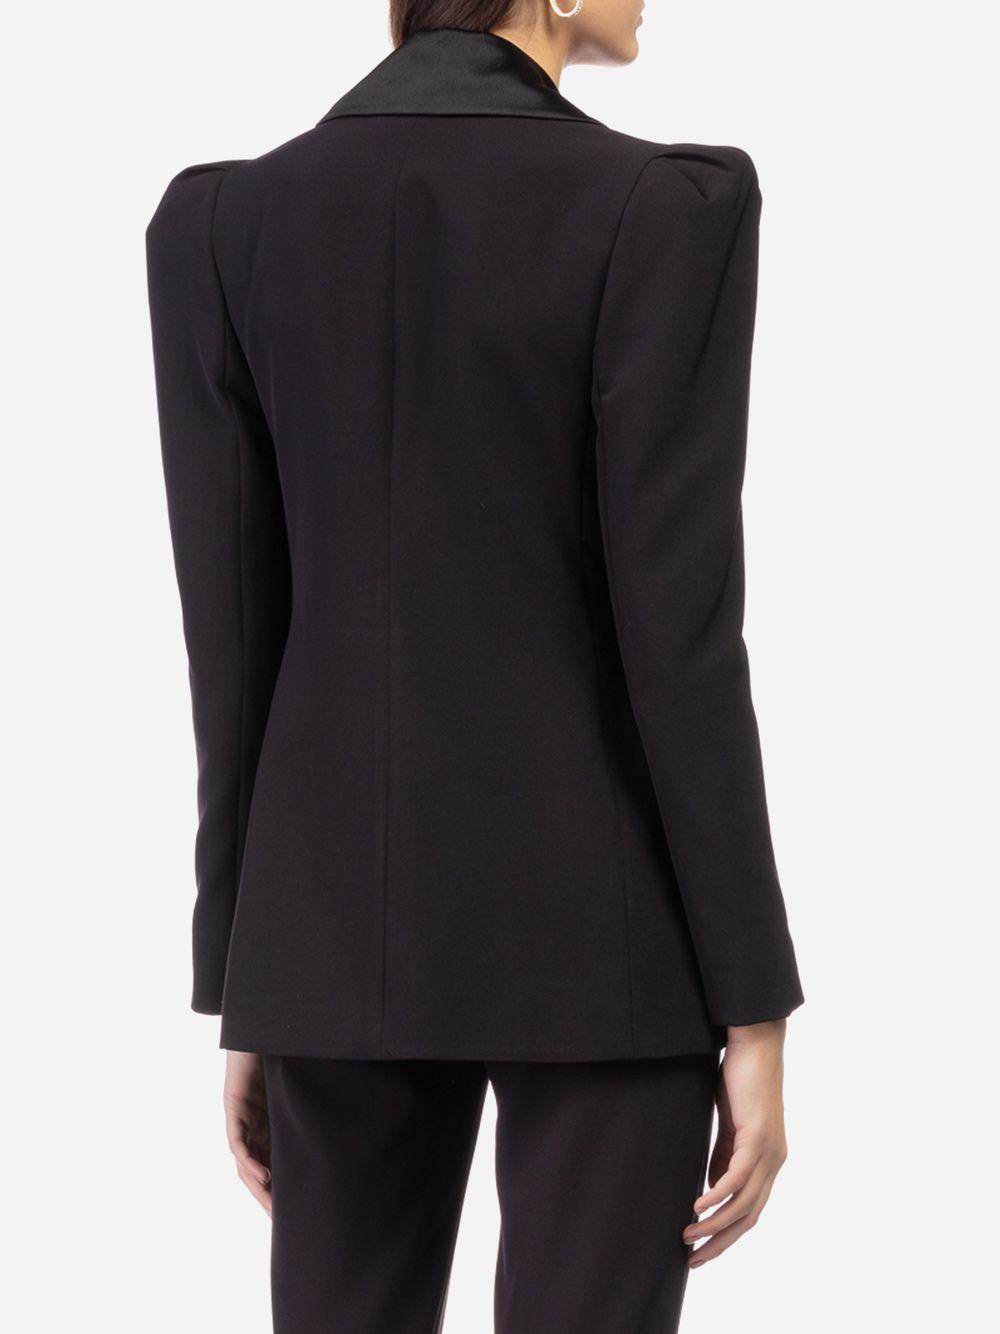 Blazer Preto Tuxedo | Elsa Barreto